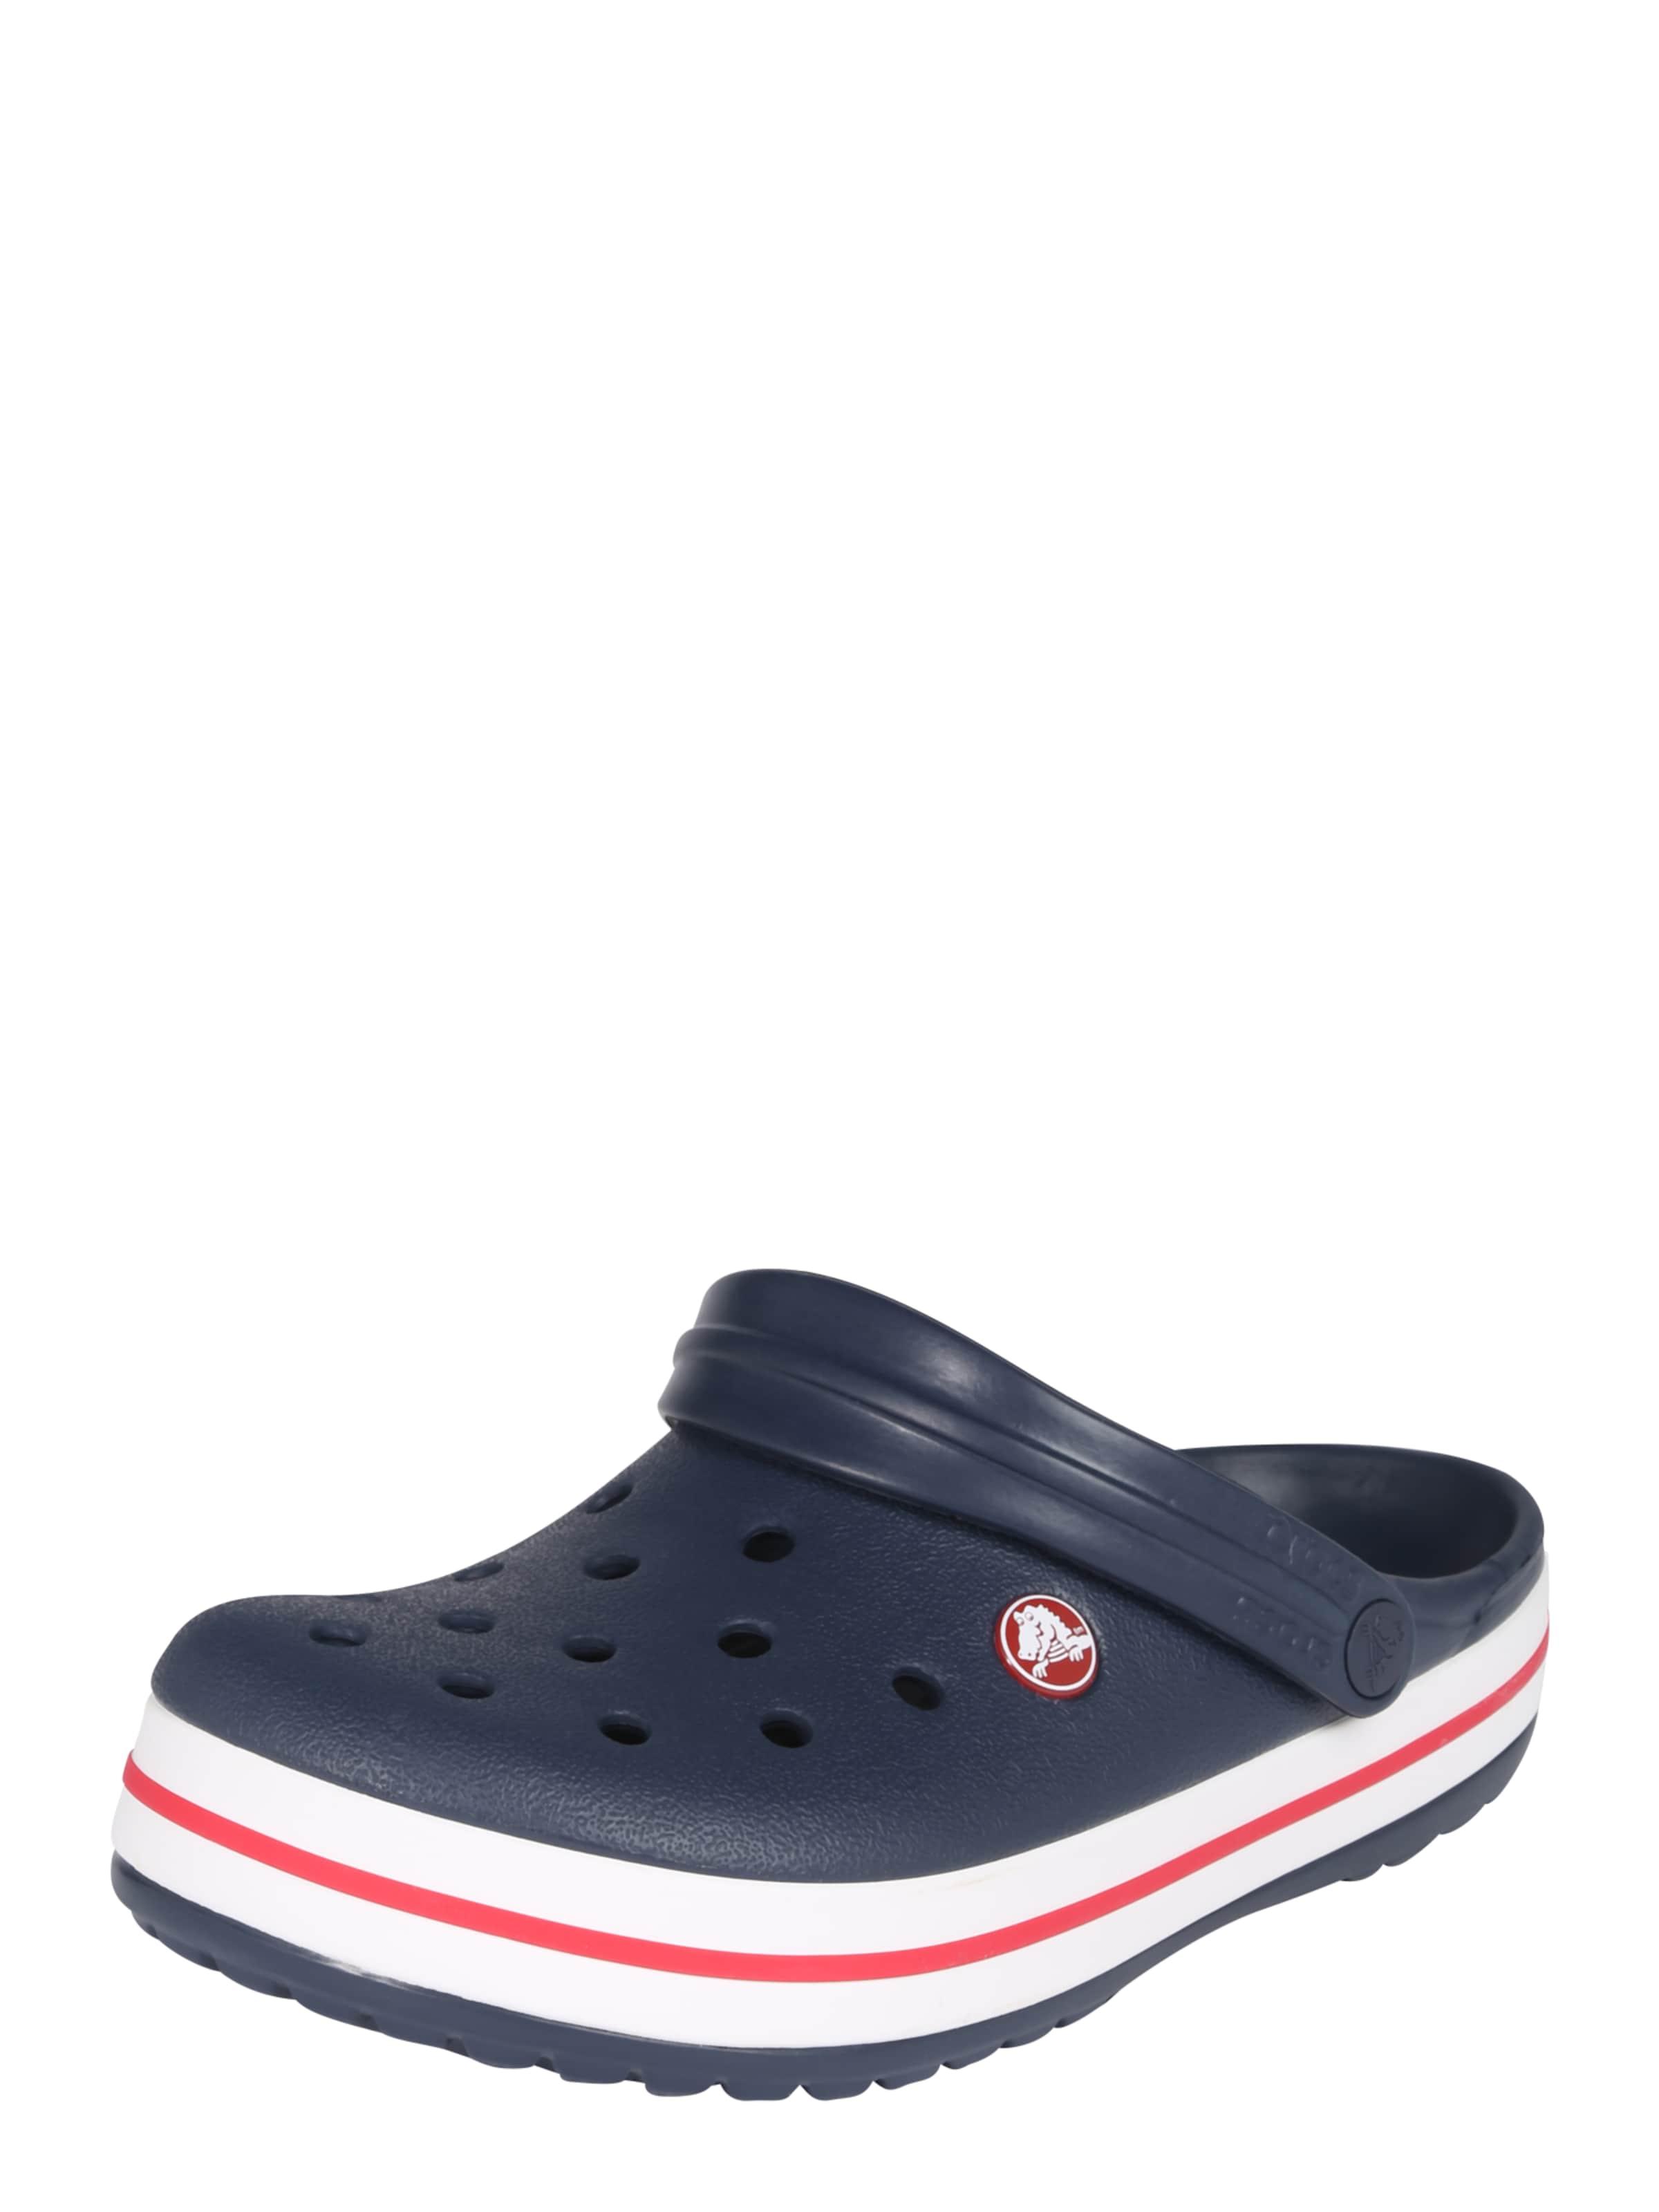 'crocband' Crocs Crocs Navy Pantolette Pantolette In 'crocband' mN0w8n